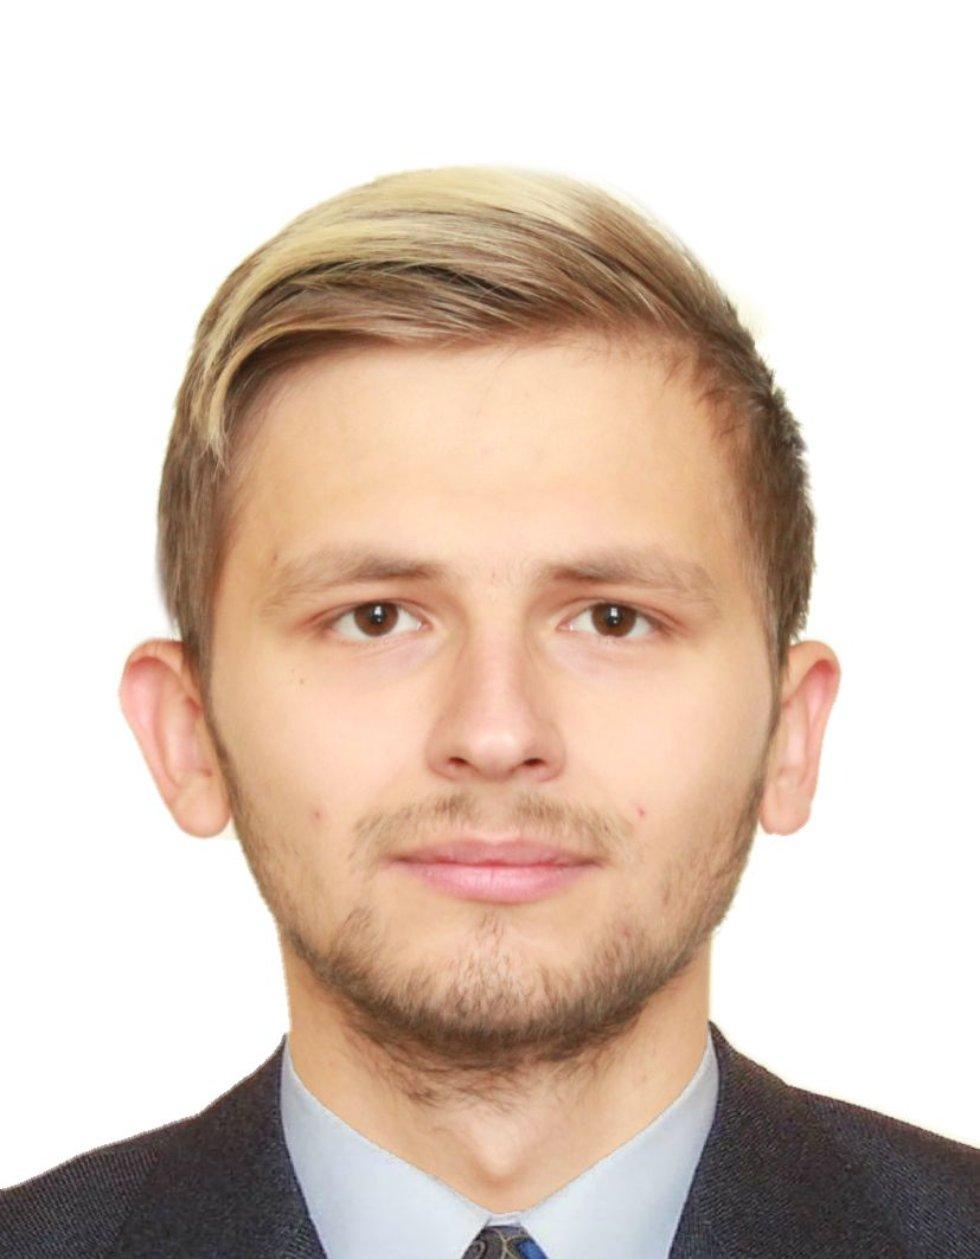 Балакин Дмитрий Александрович